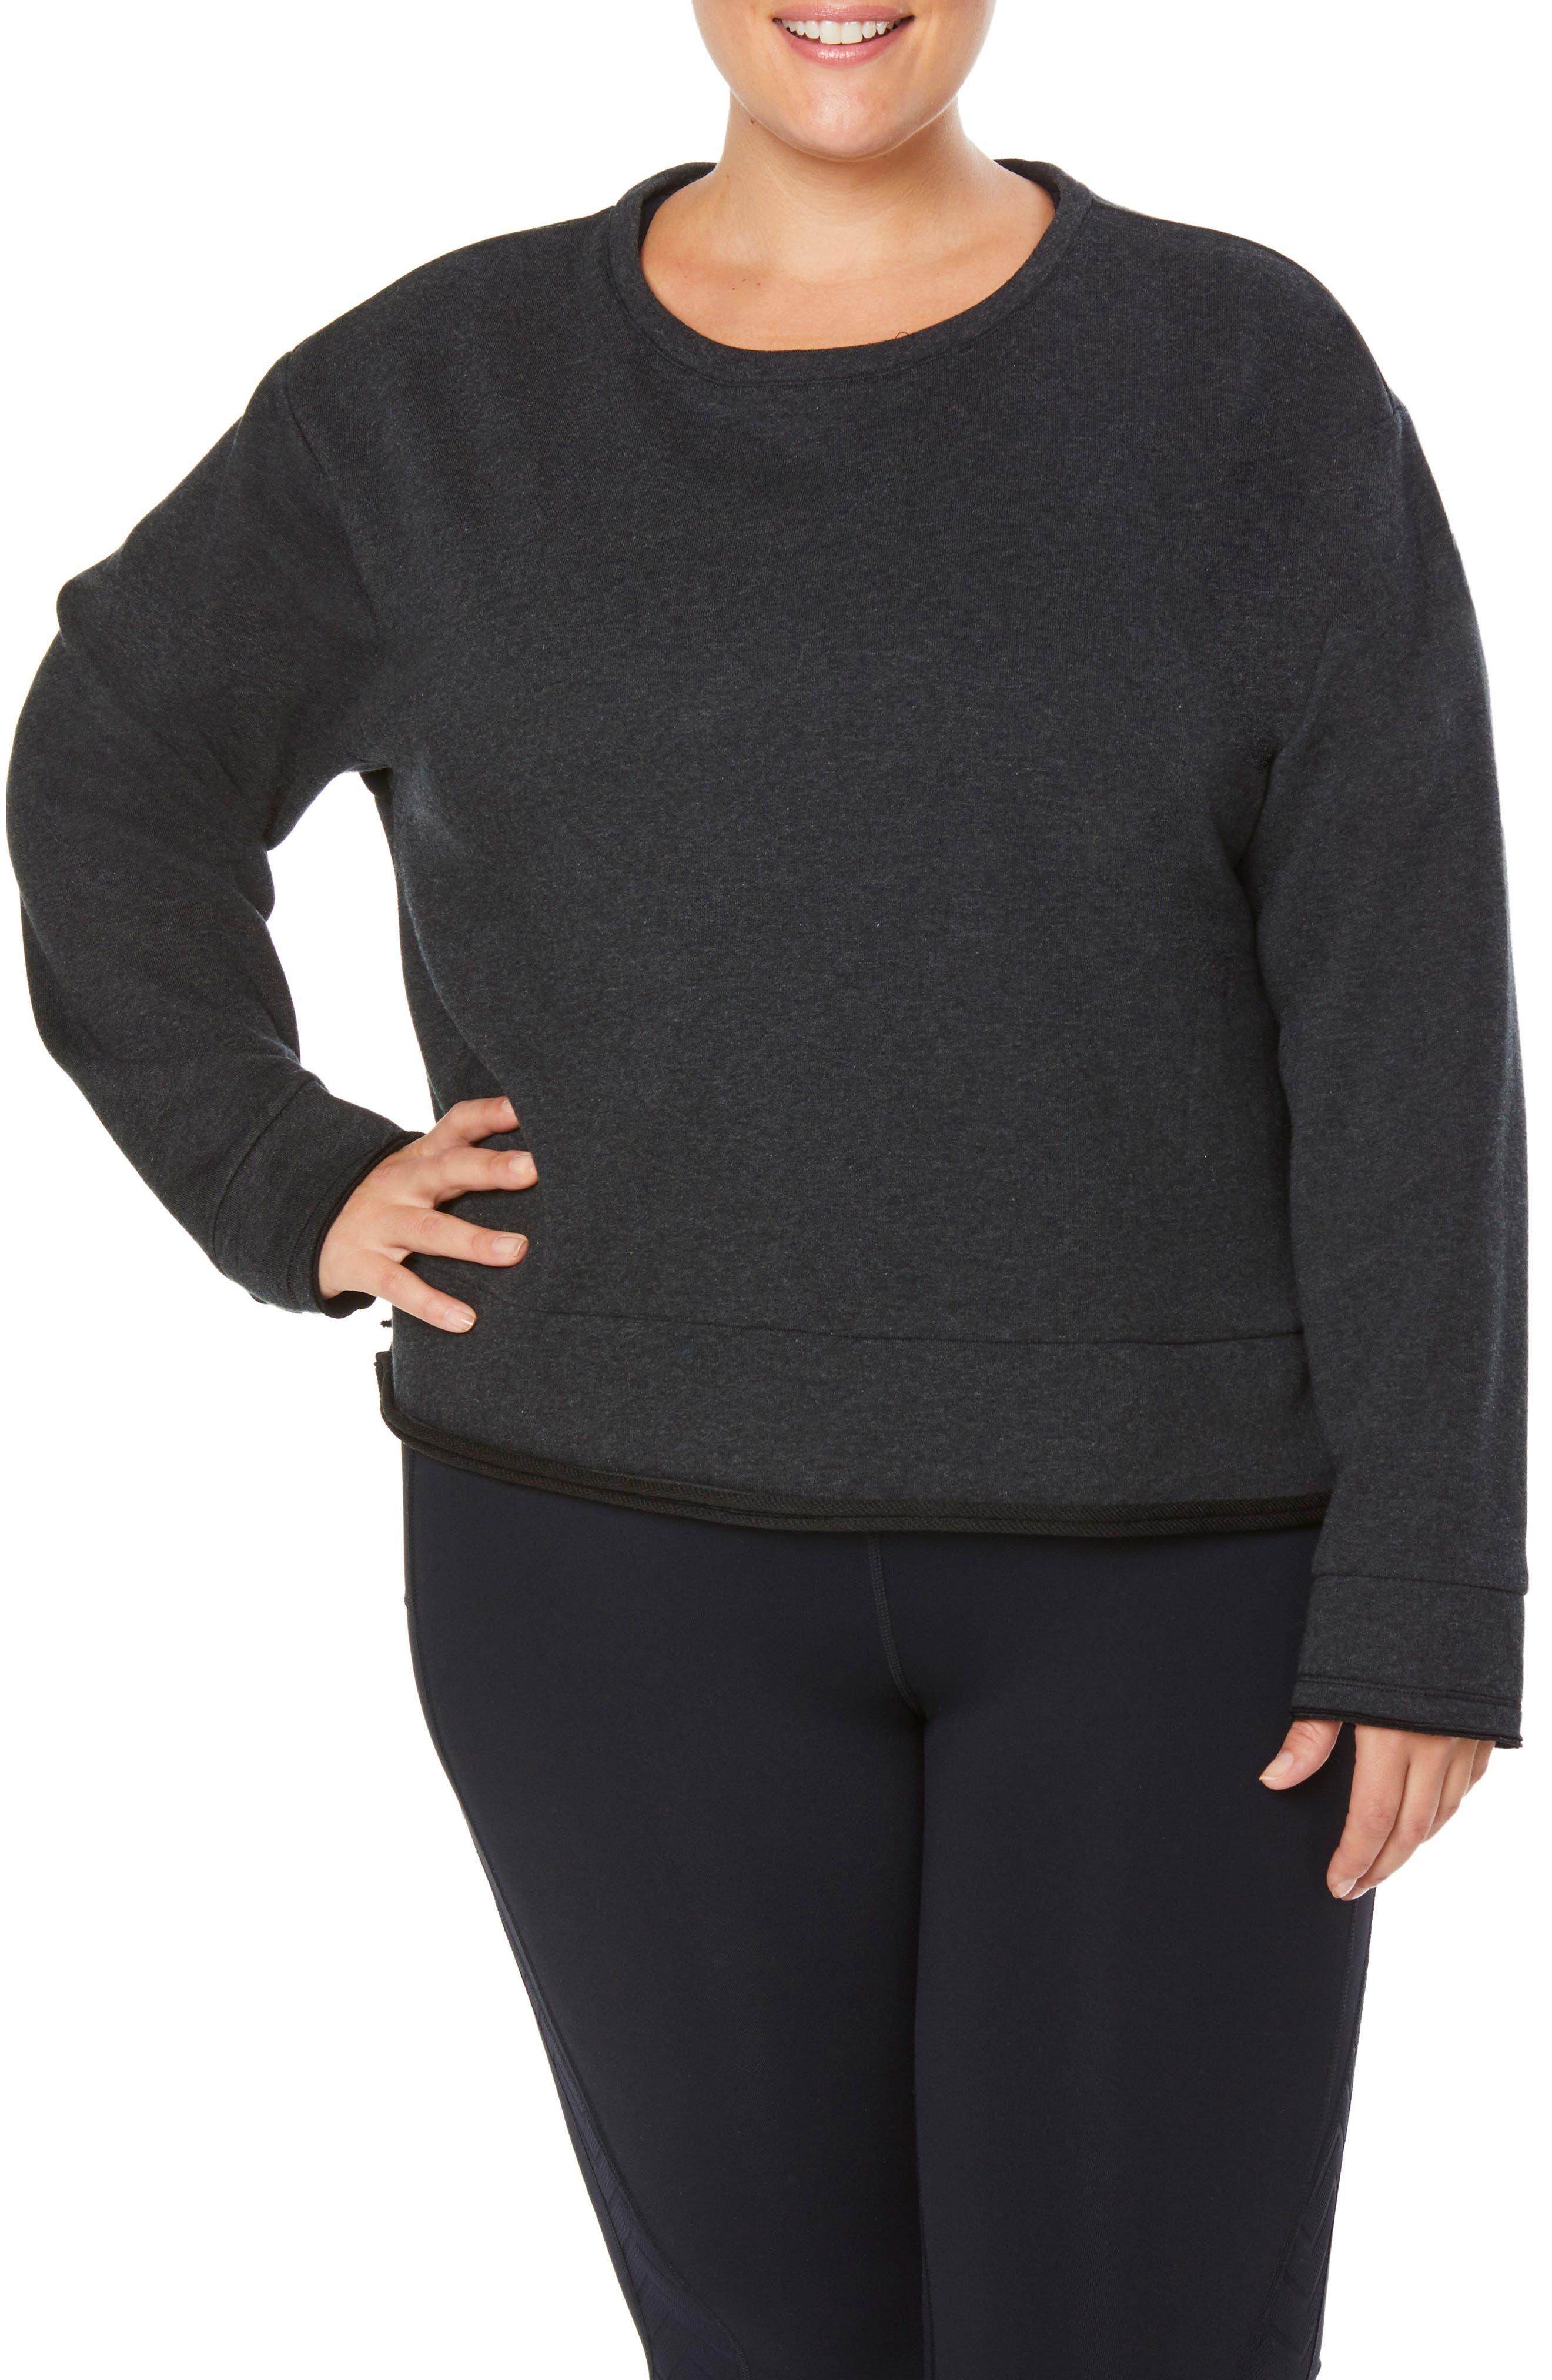 Shape Extended Day Sweatshirt,                             Main thumbnail 1, color,                             CHARCOAL BLACK